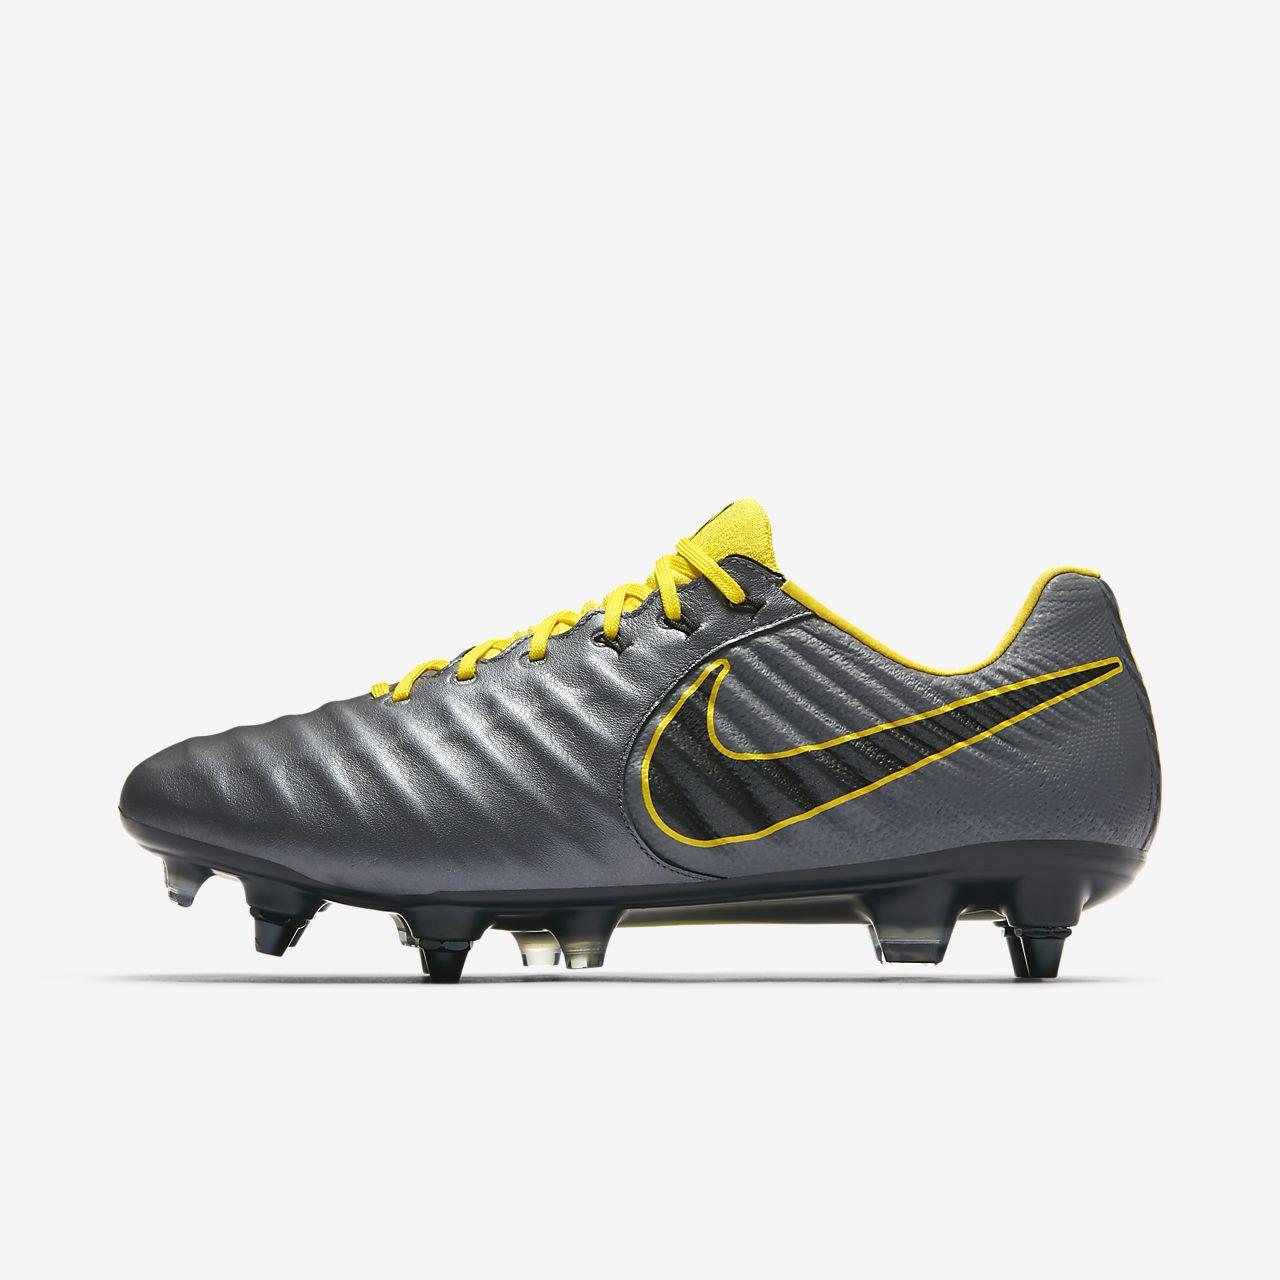 new style 14280 b7eae ... Fotbollssko för vått gräs Nike Tiempo Legend VII Elite SG-Pro Anti-Clog